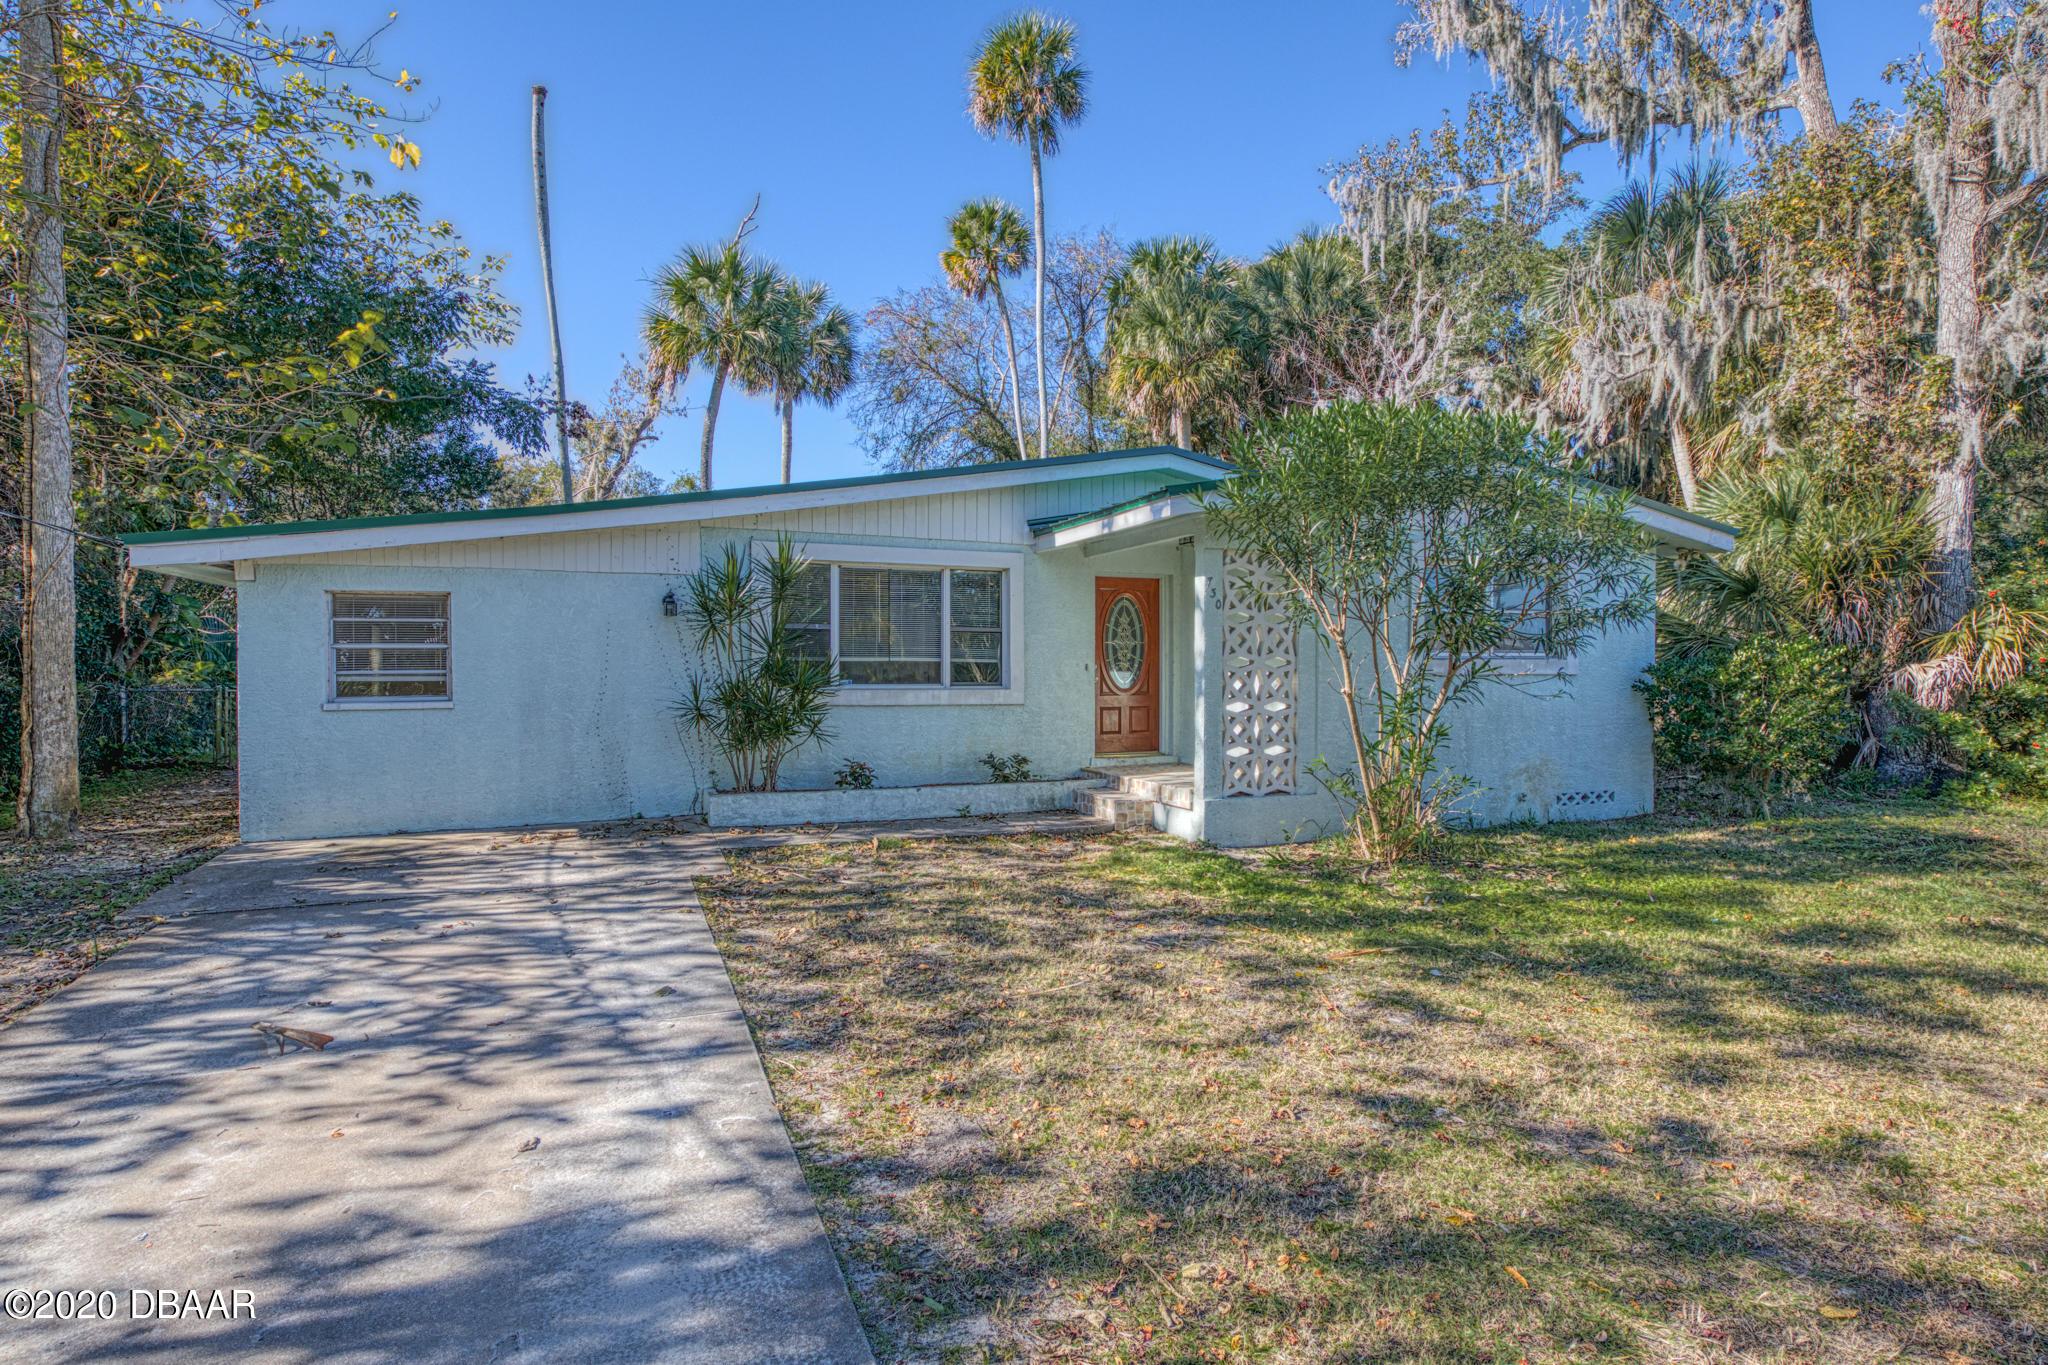 Photo of 730 Briarwood Drive, Daytona Beach, FL 32114